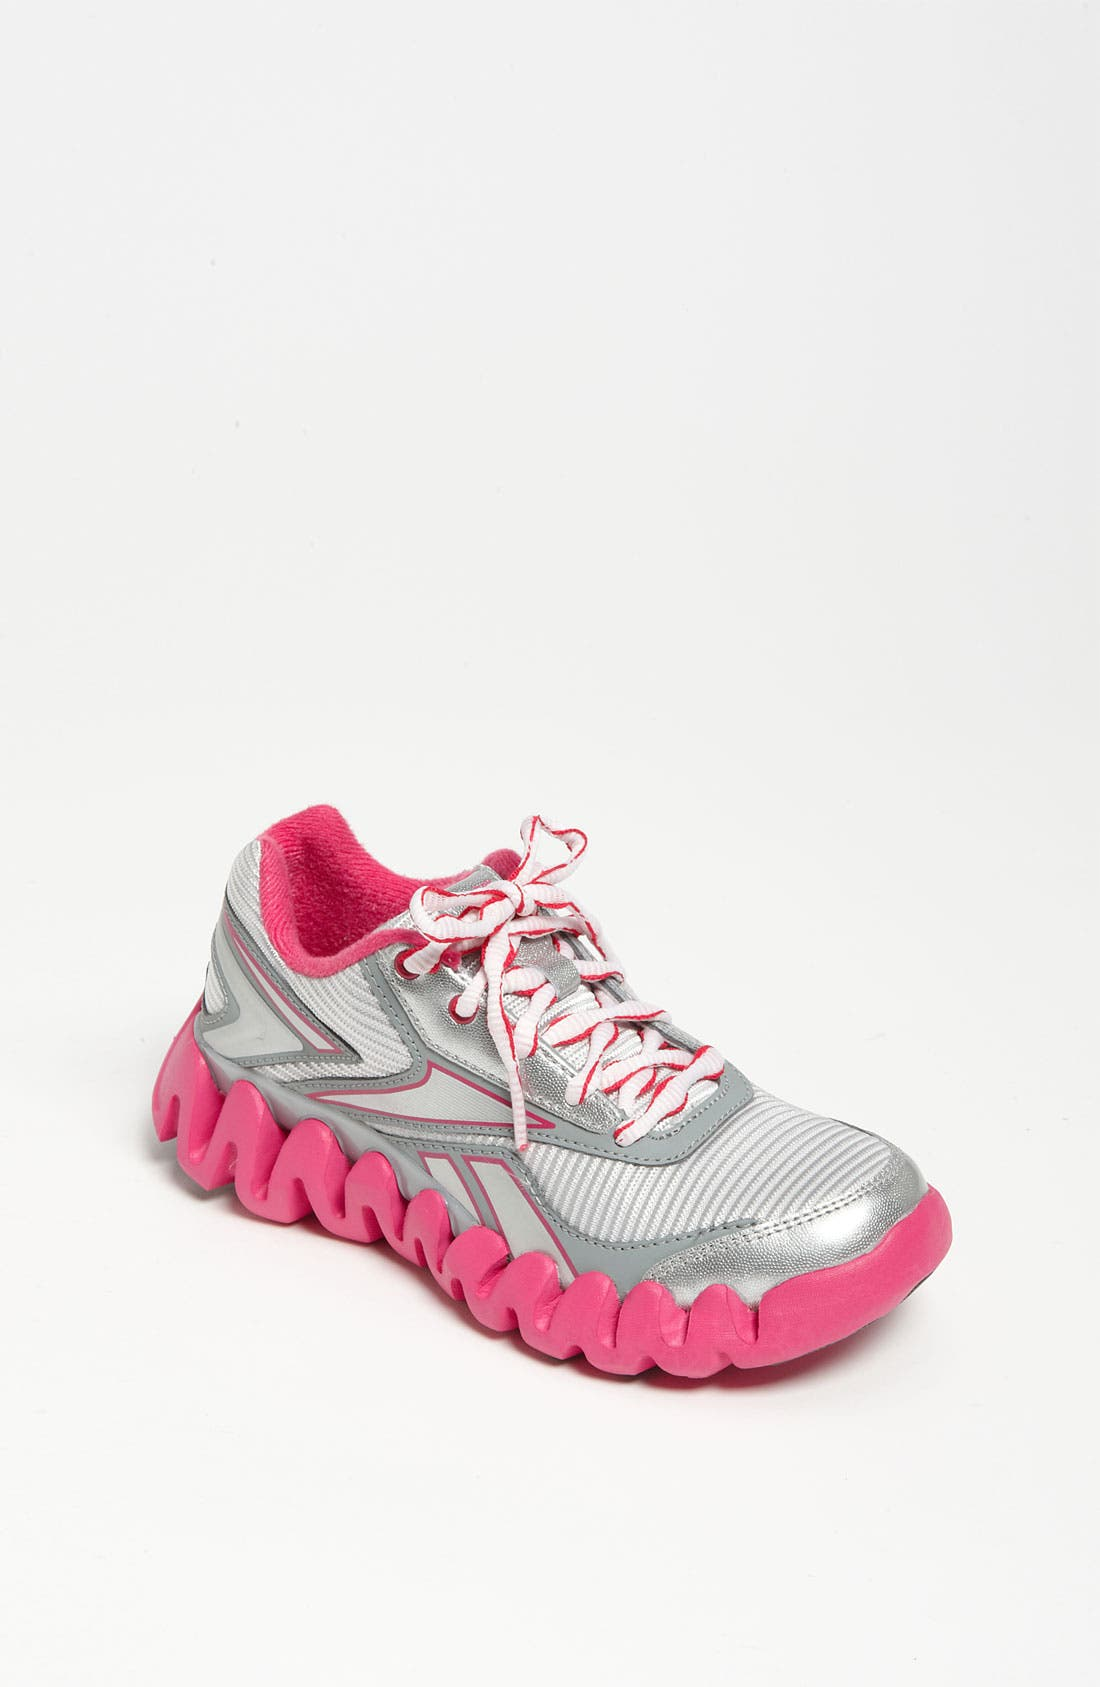 Main Image - Reebok 'ZigActivate' Running Shoe (Little Kid & Big Kid)